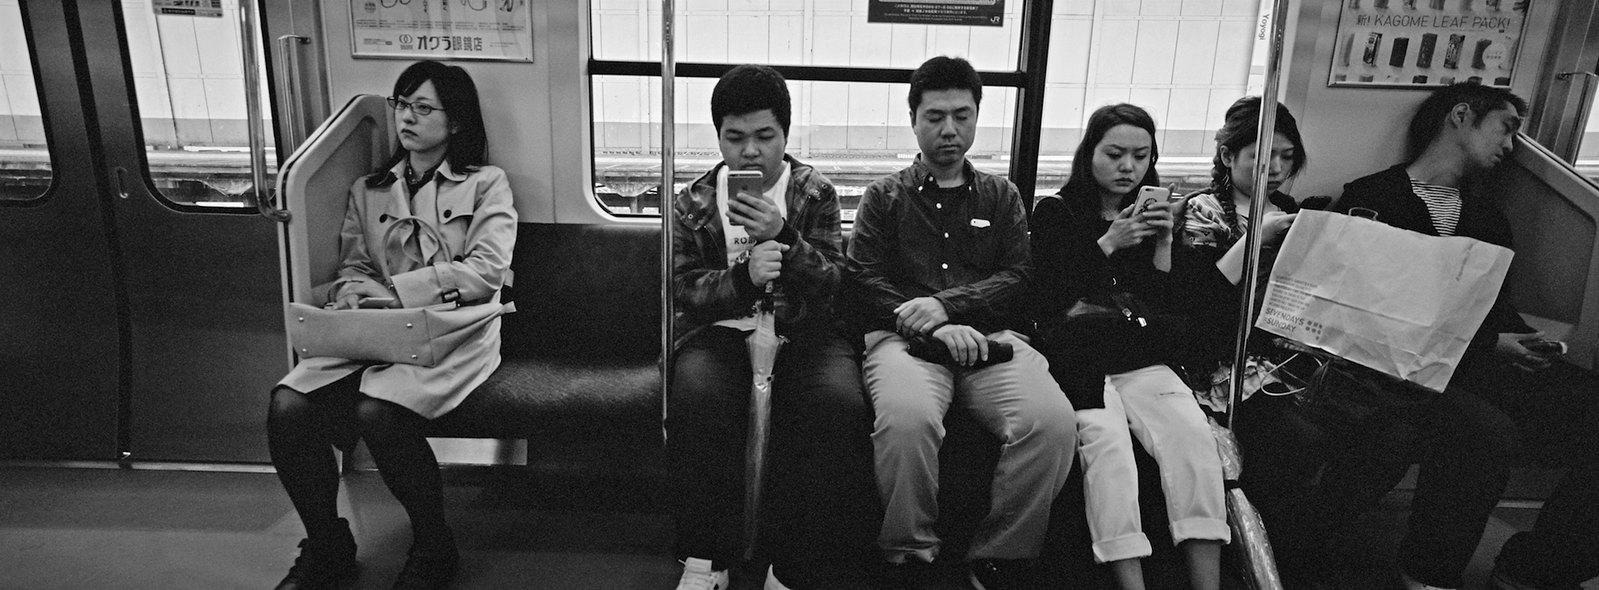 Commuters: Tokyo